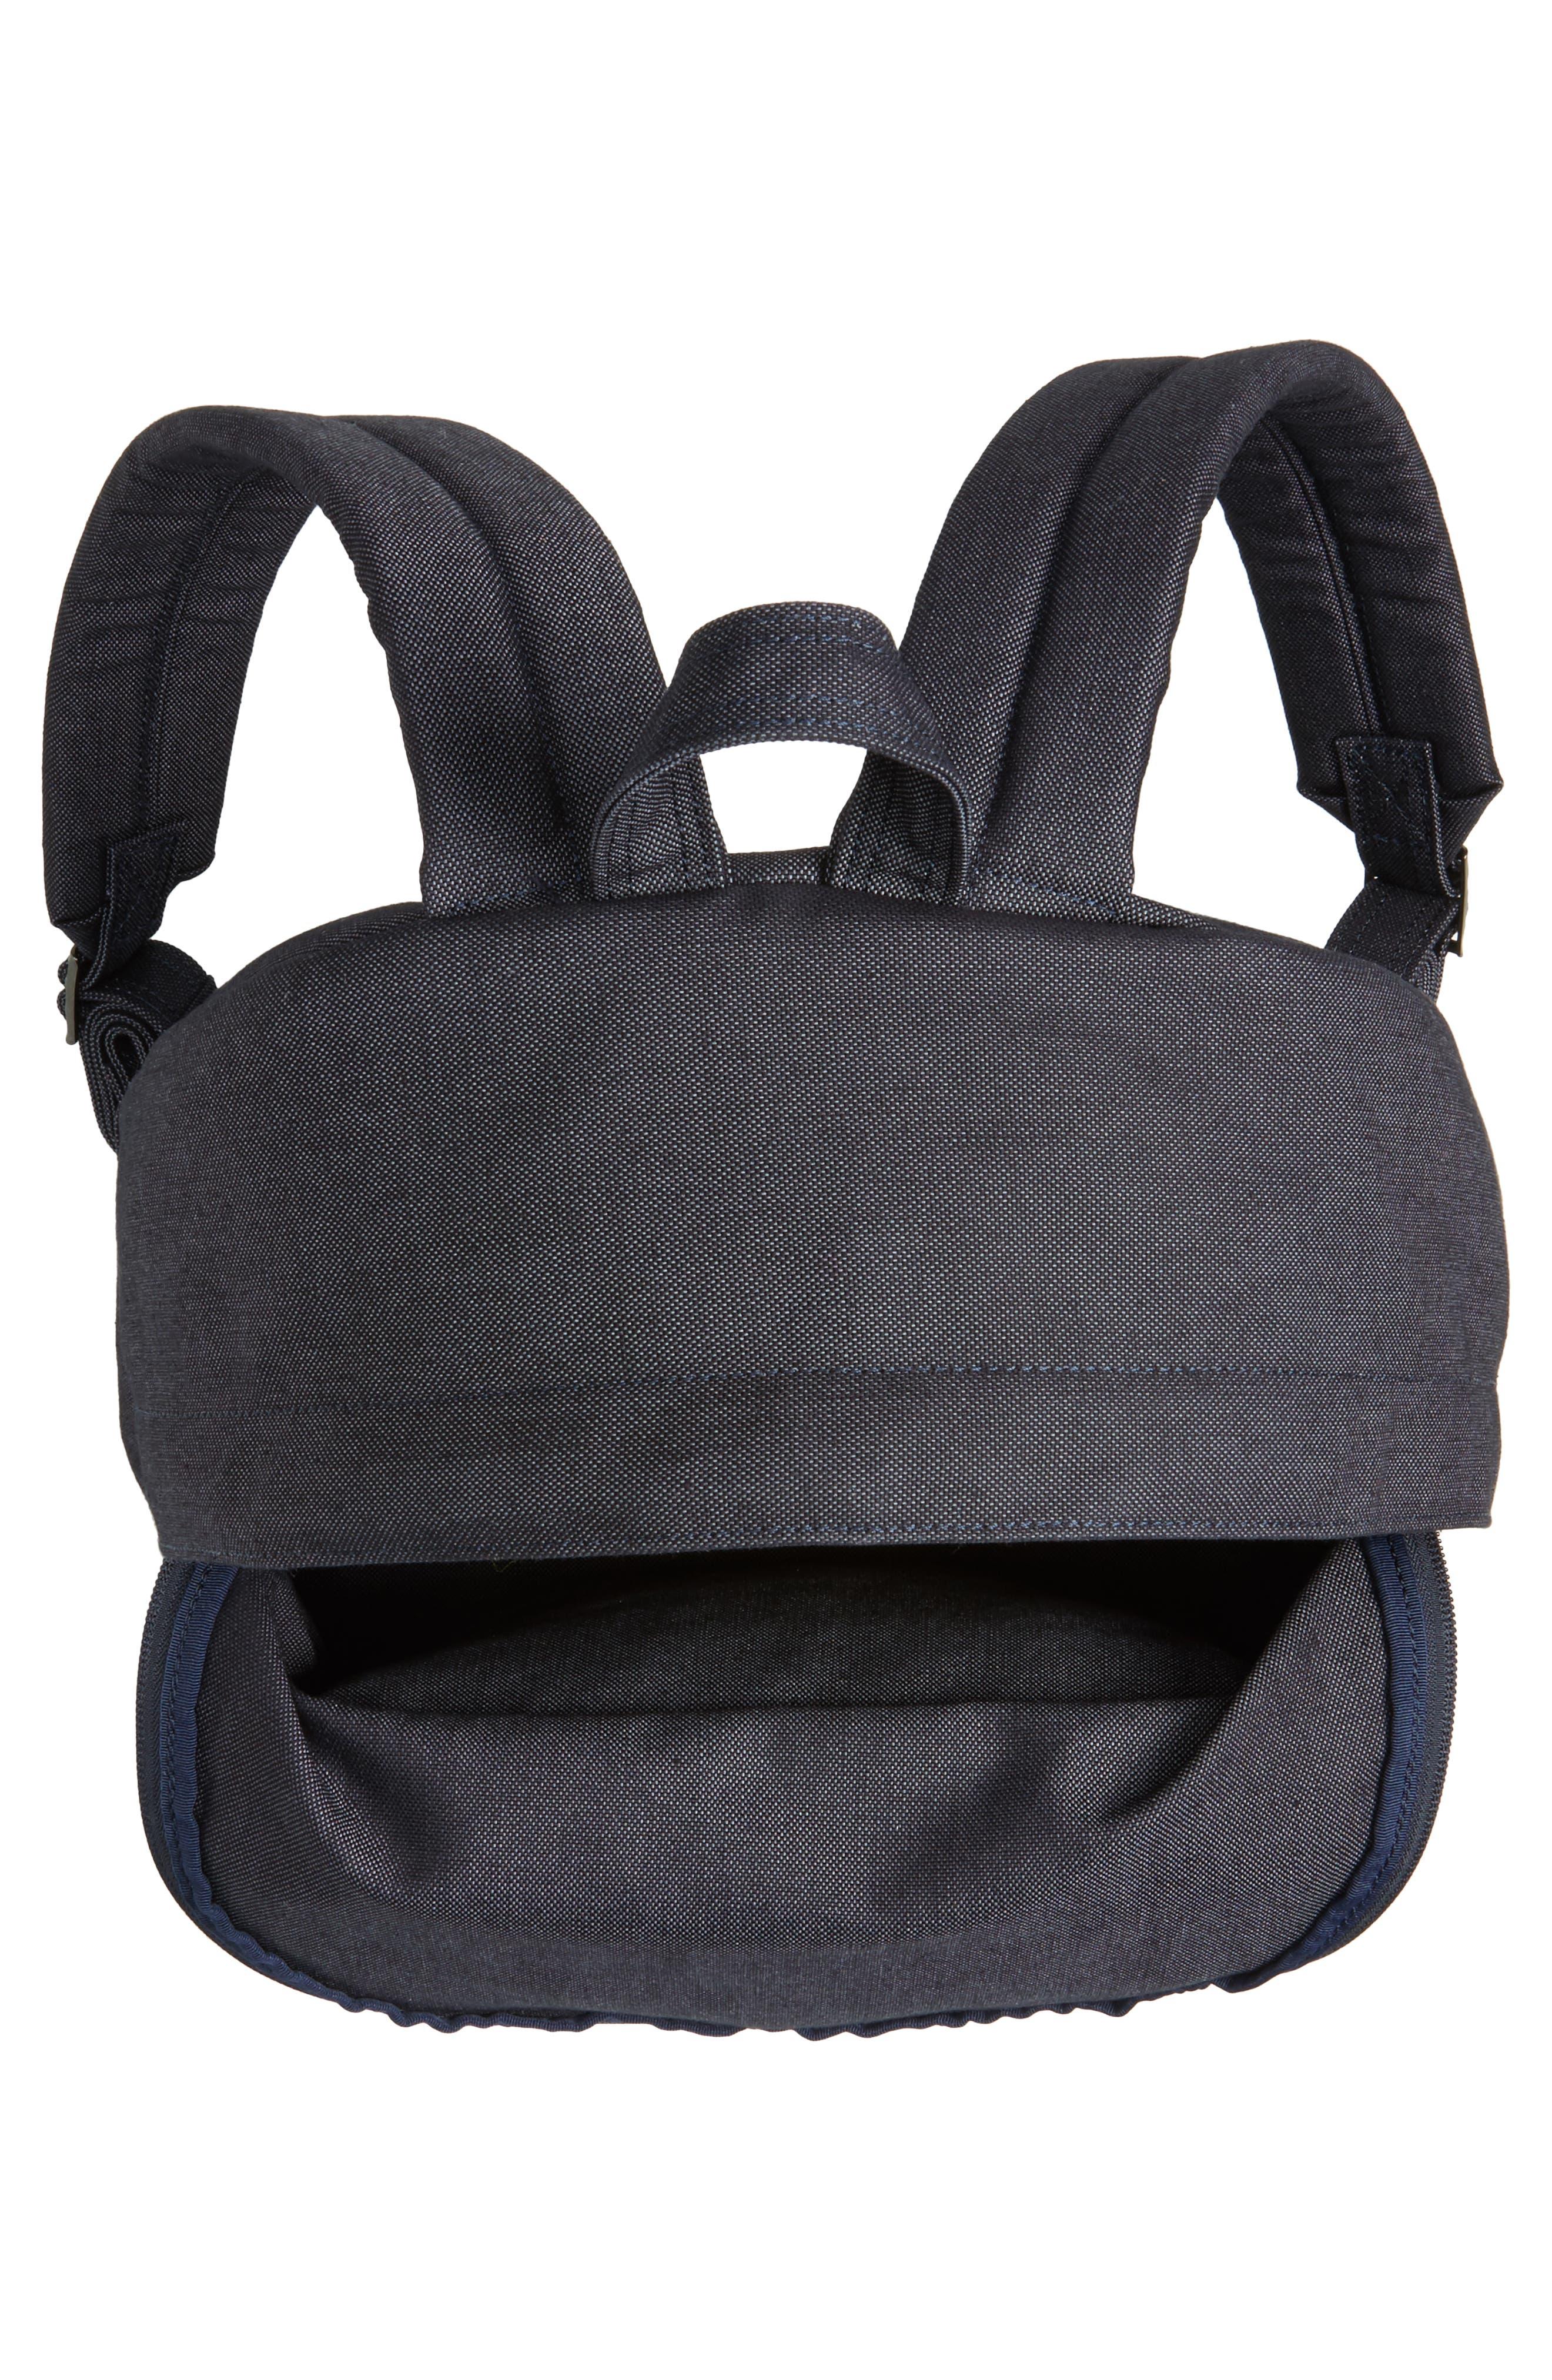 Porter-Yoshida & Co. Smoky Backpack,                             Alternate thumbnail 4, color,                             400